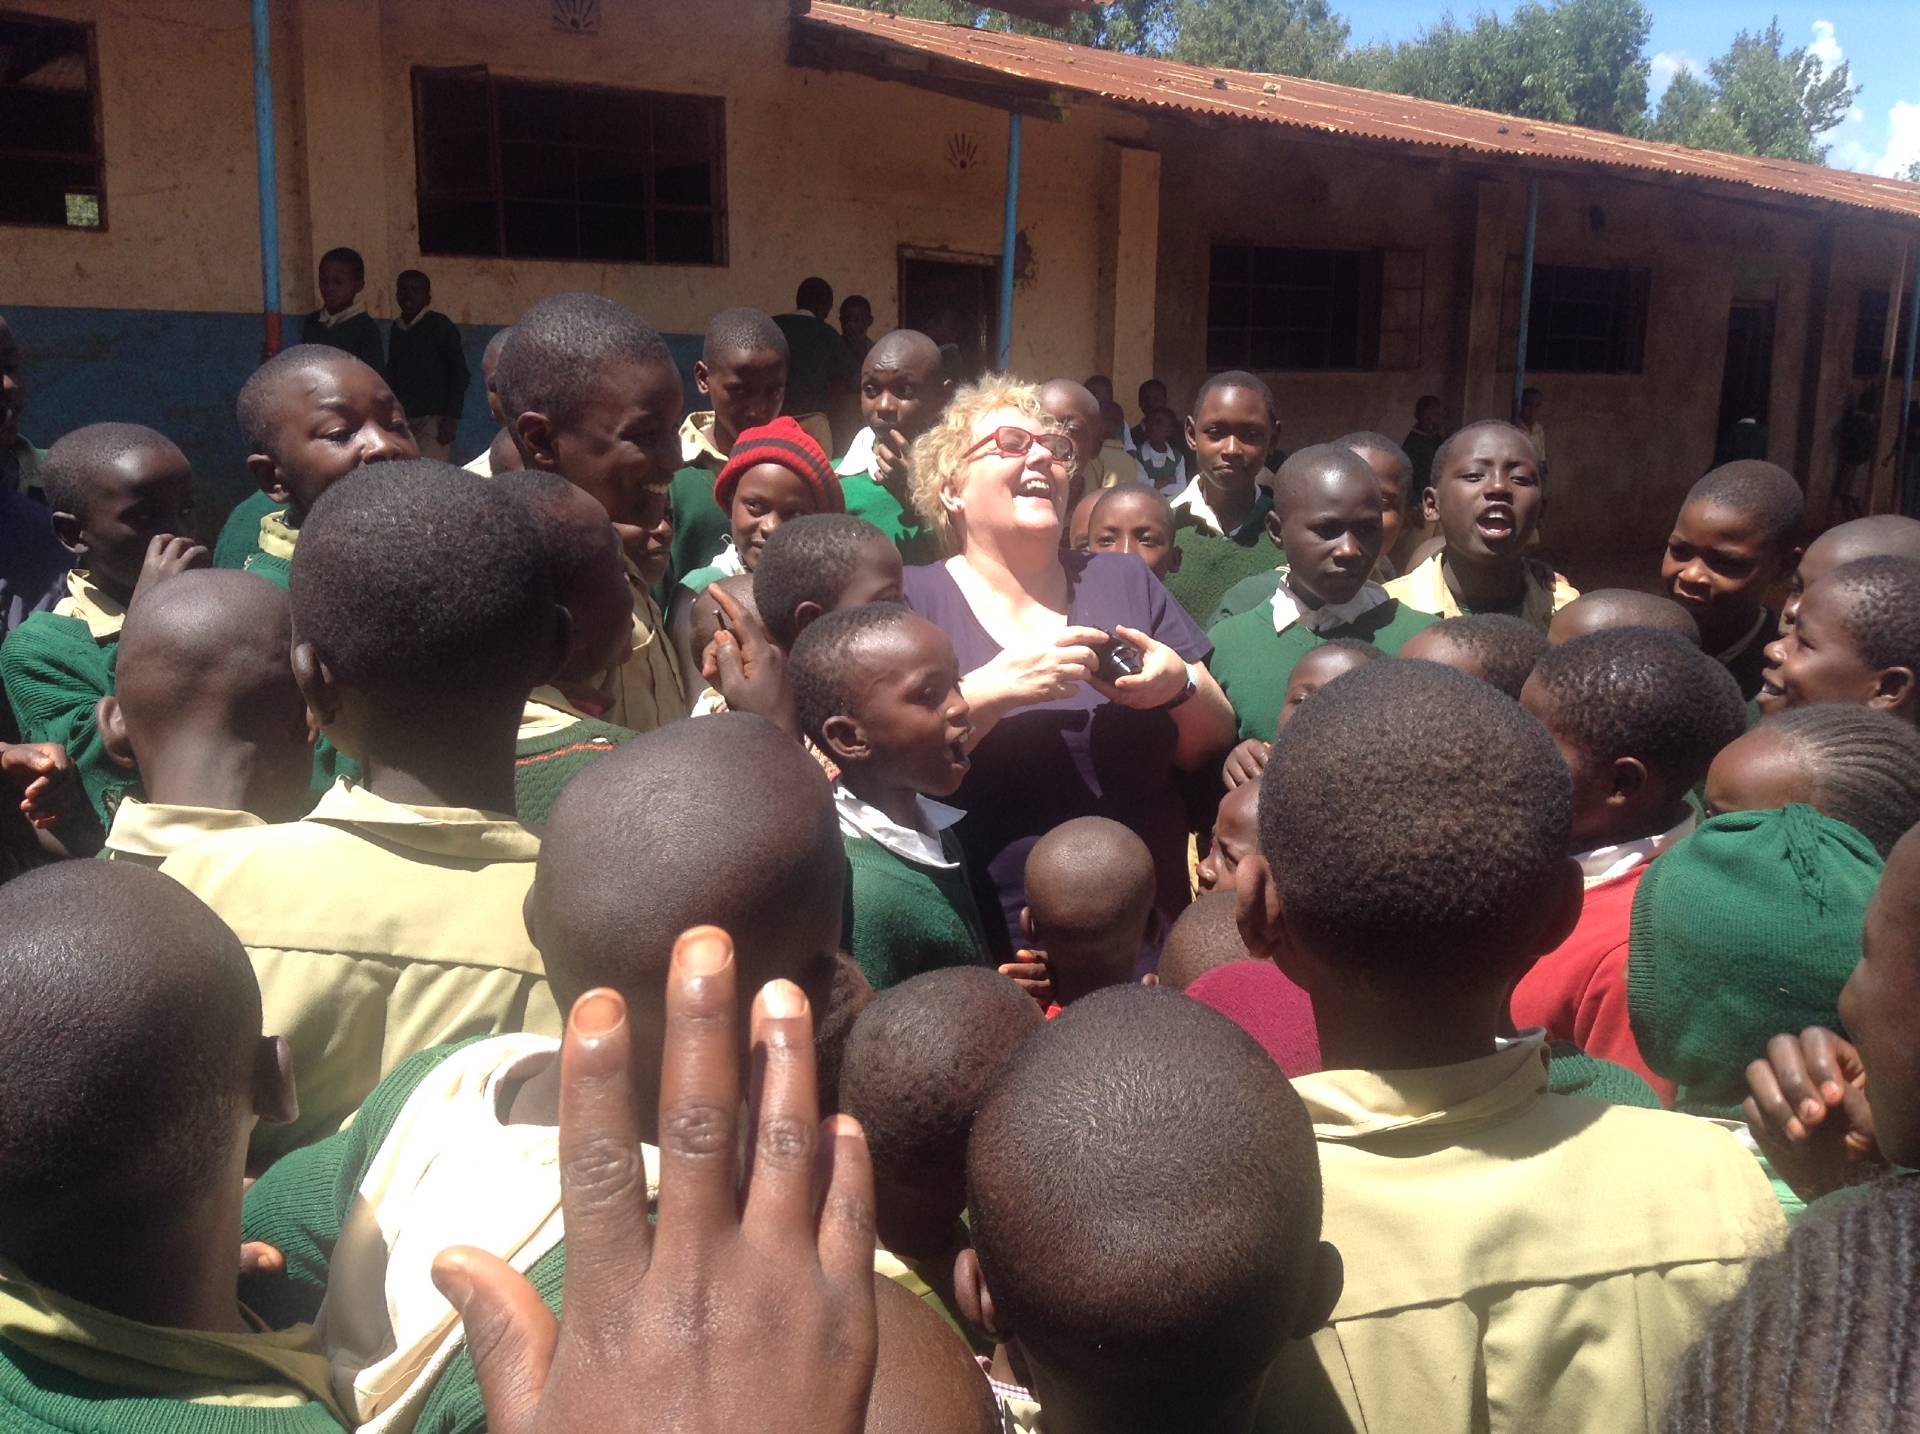 Pamela Draycott surrounded by Kenyan children